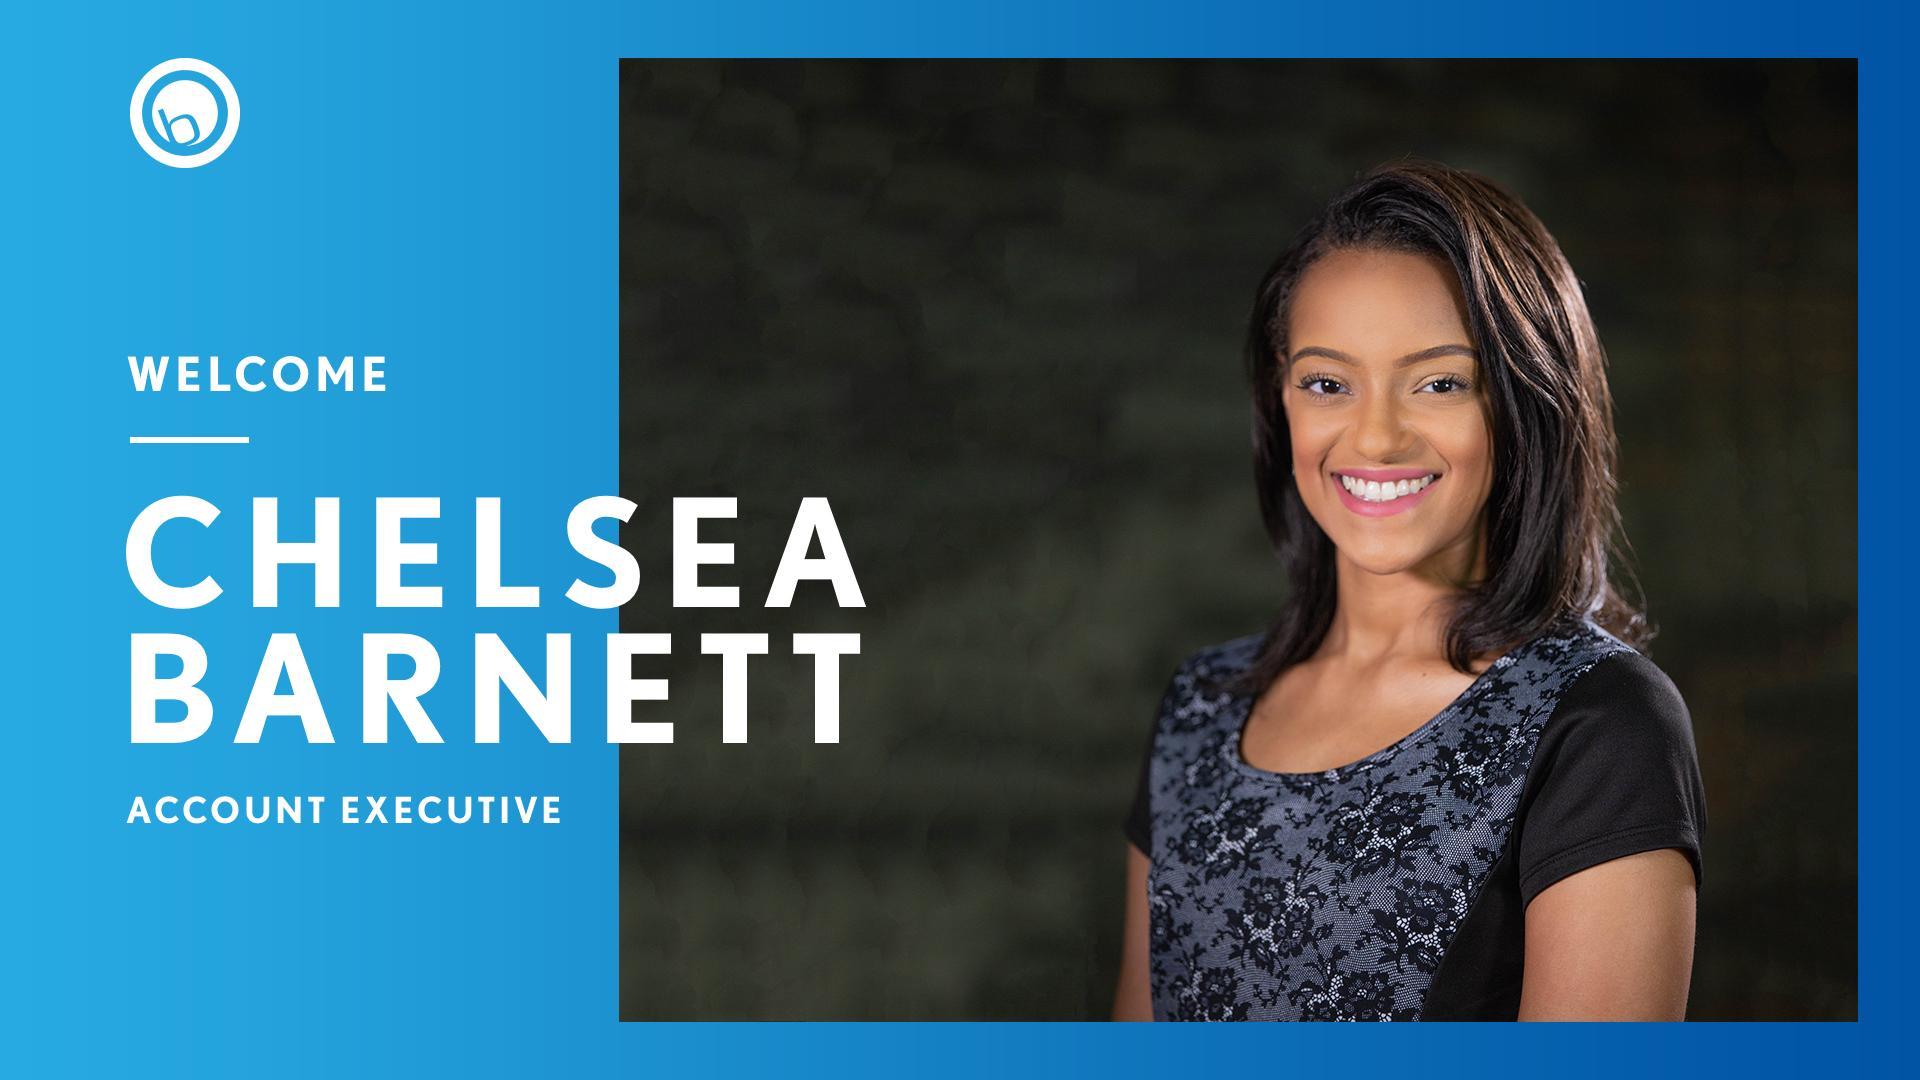 Chelsea Barnett Takes On Account Executive Position At Bartha